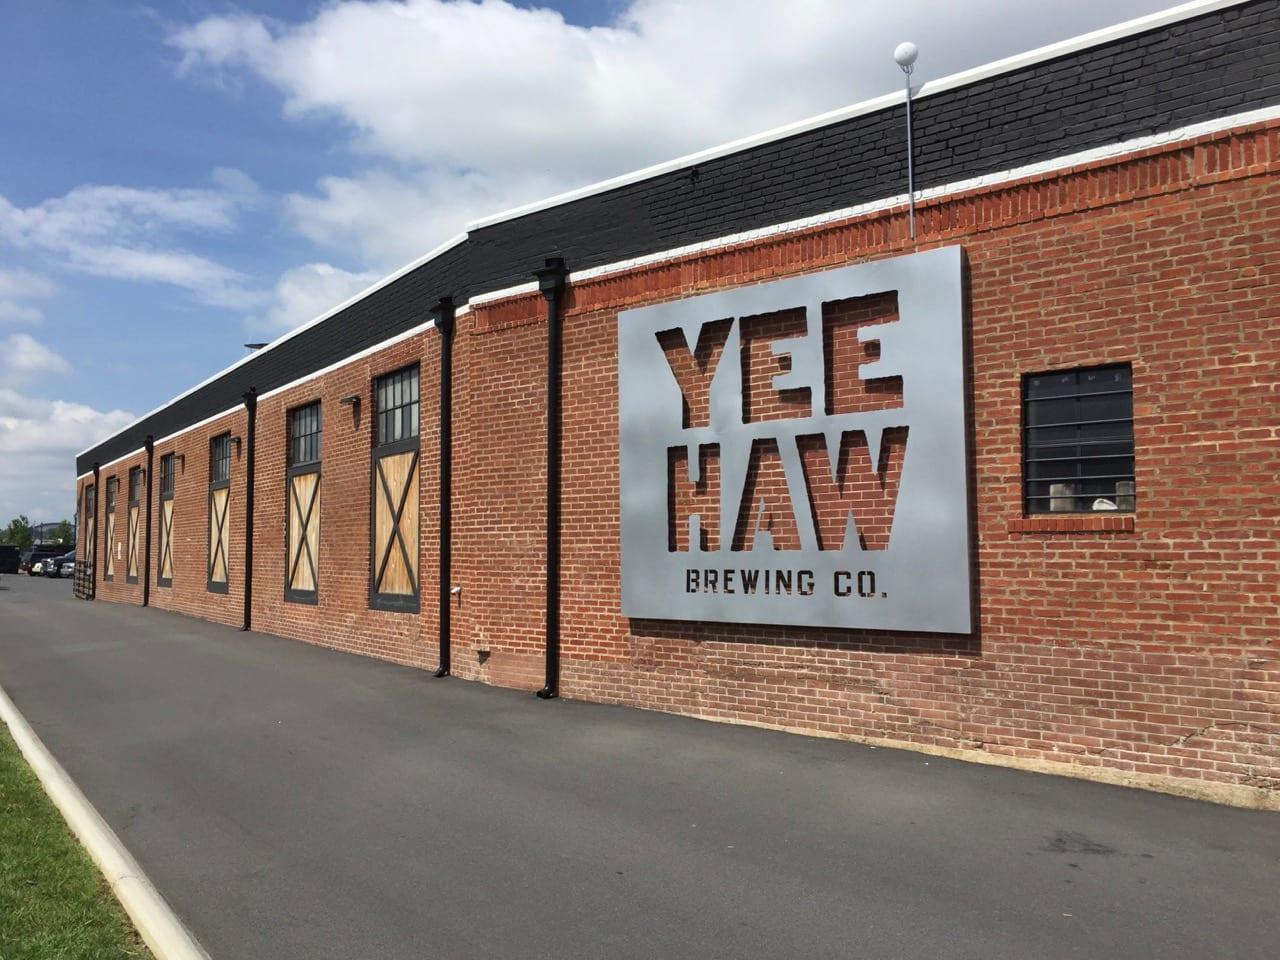 Yee Haw Brewing Company